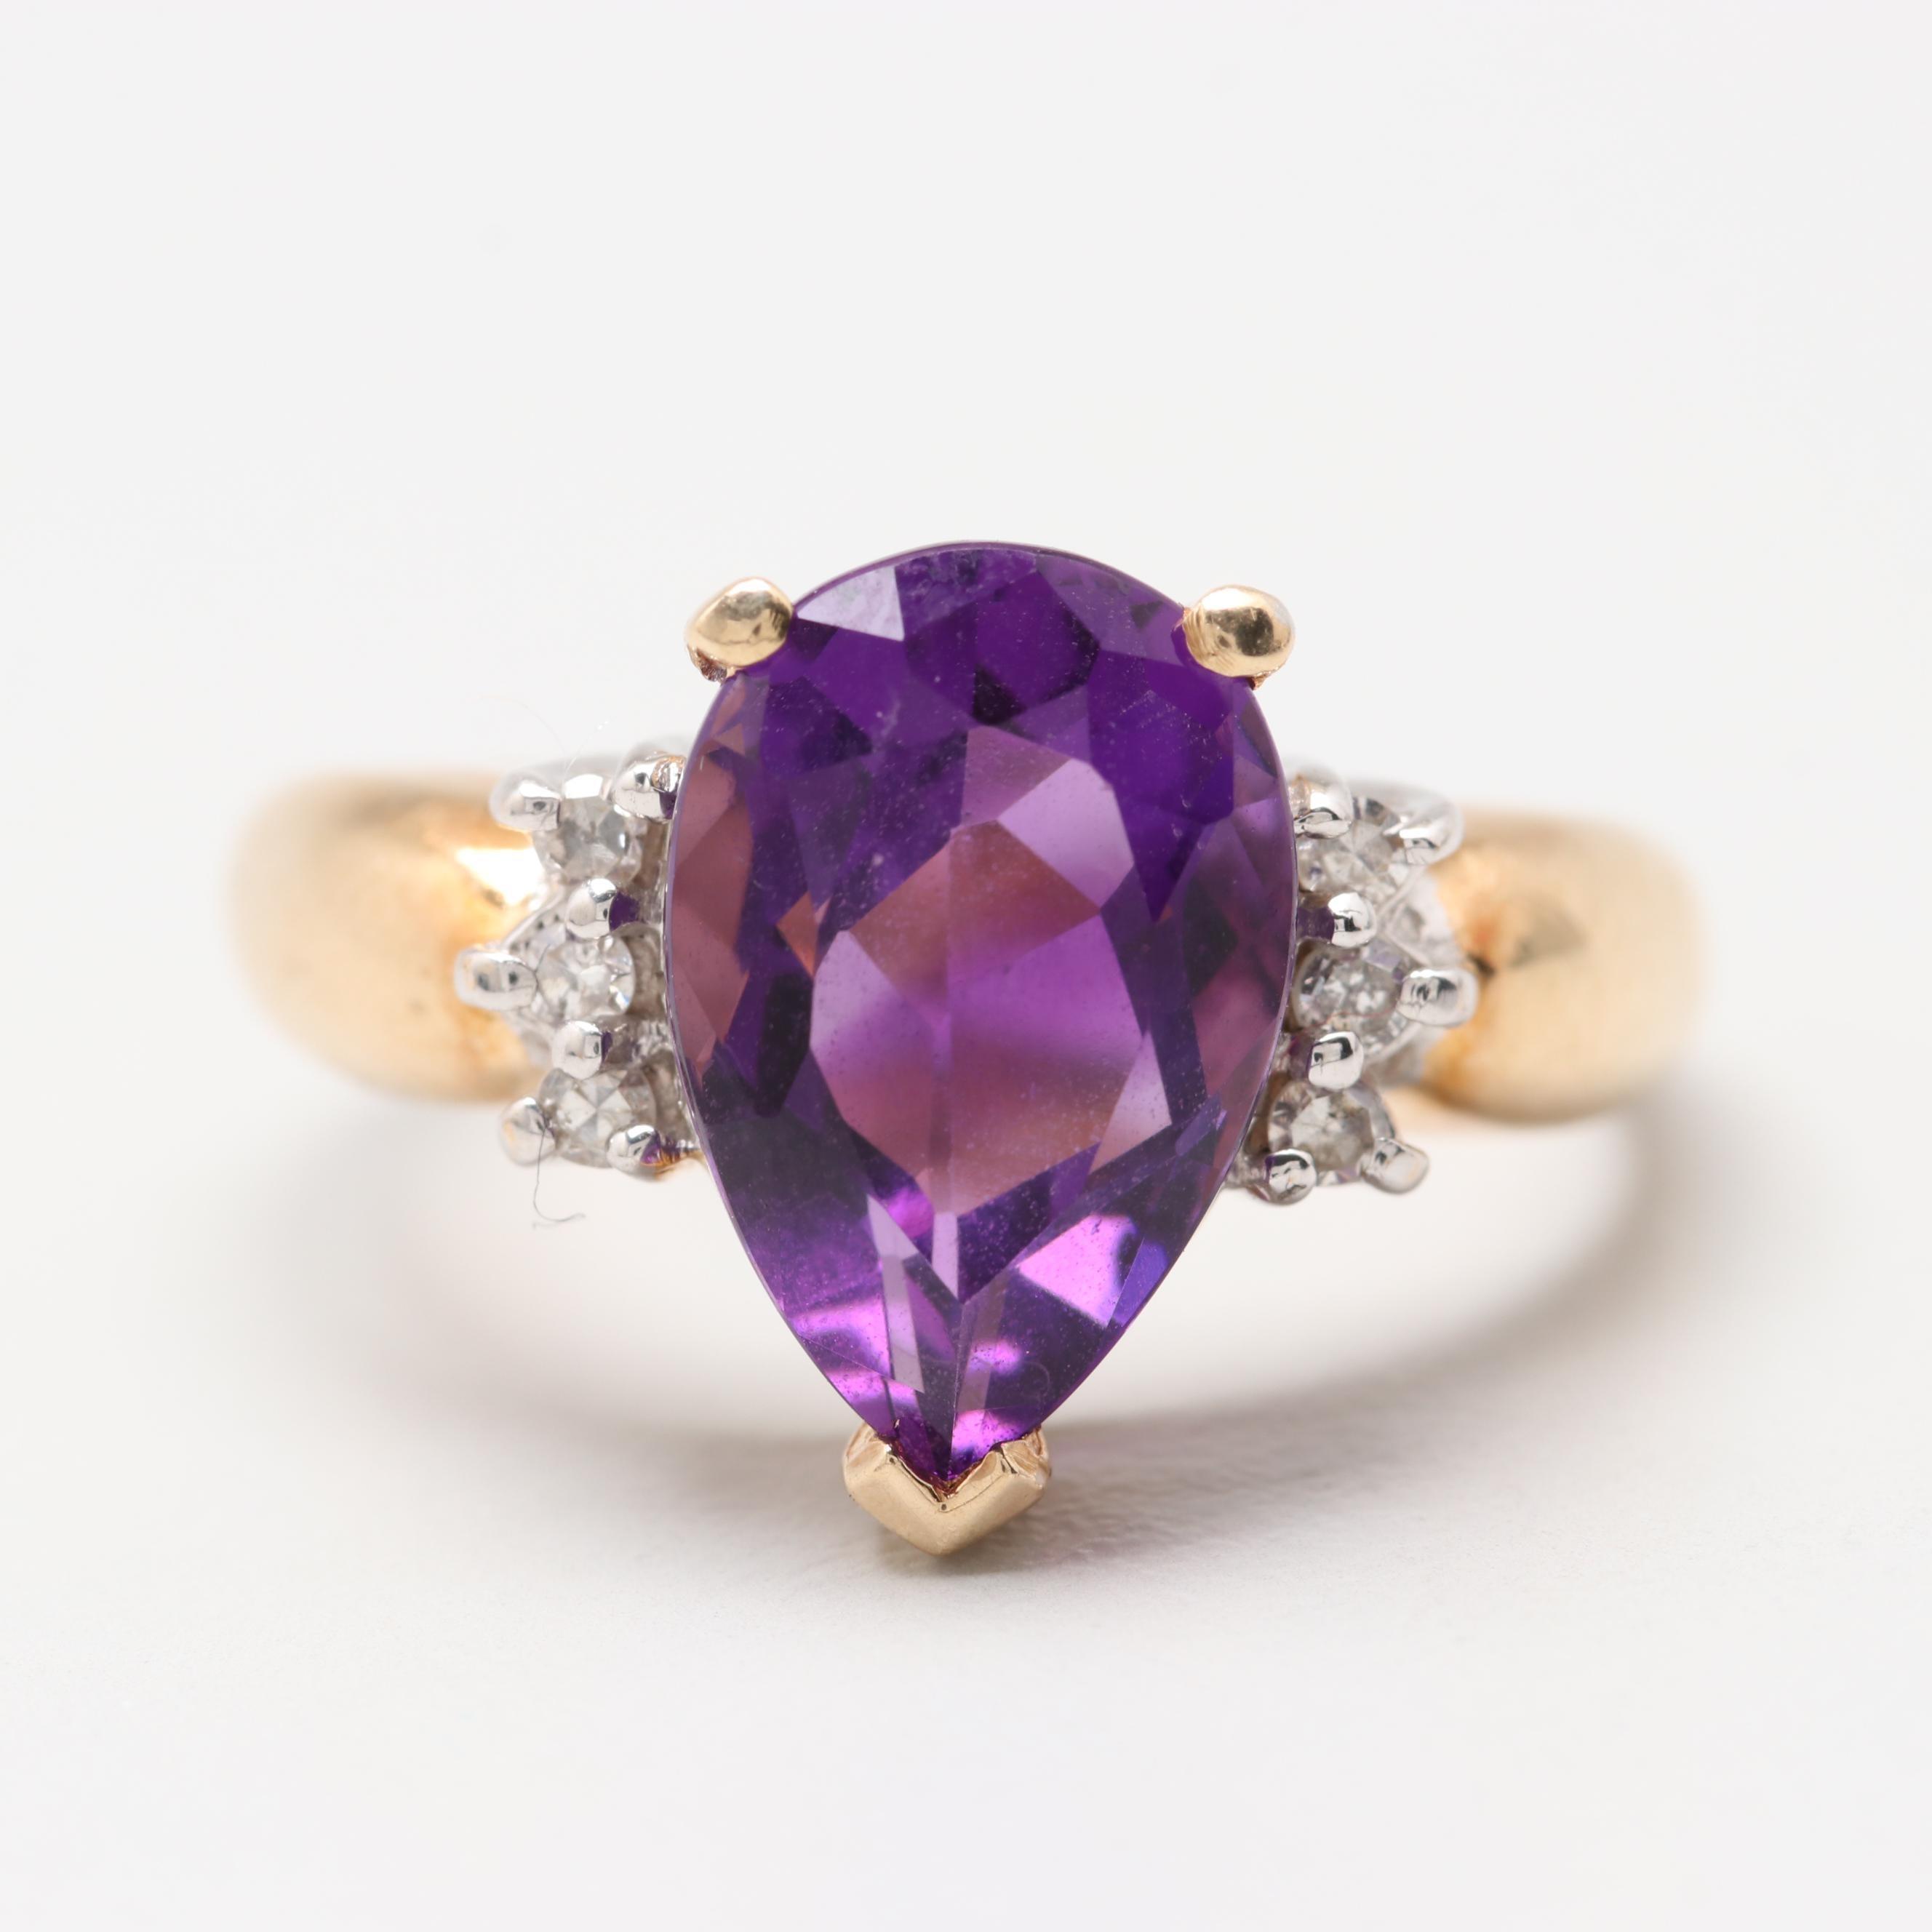 14K Yellow Gold Amethyst and Diamond Ring